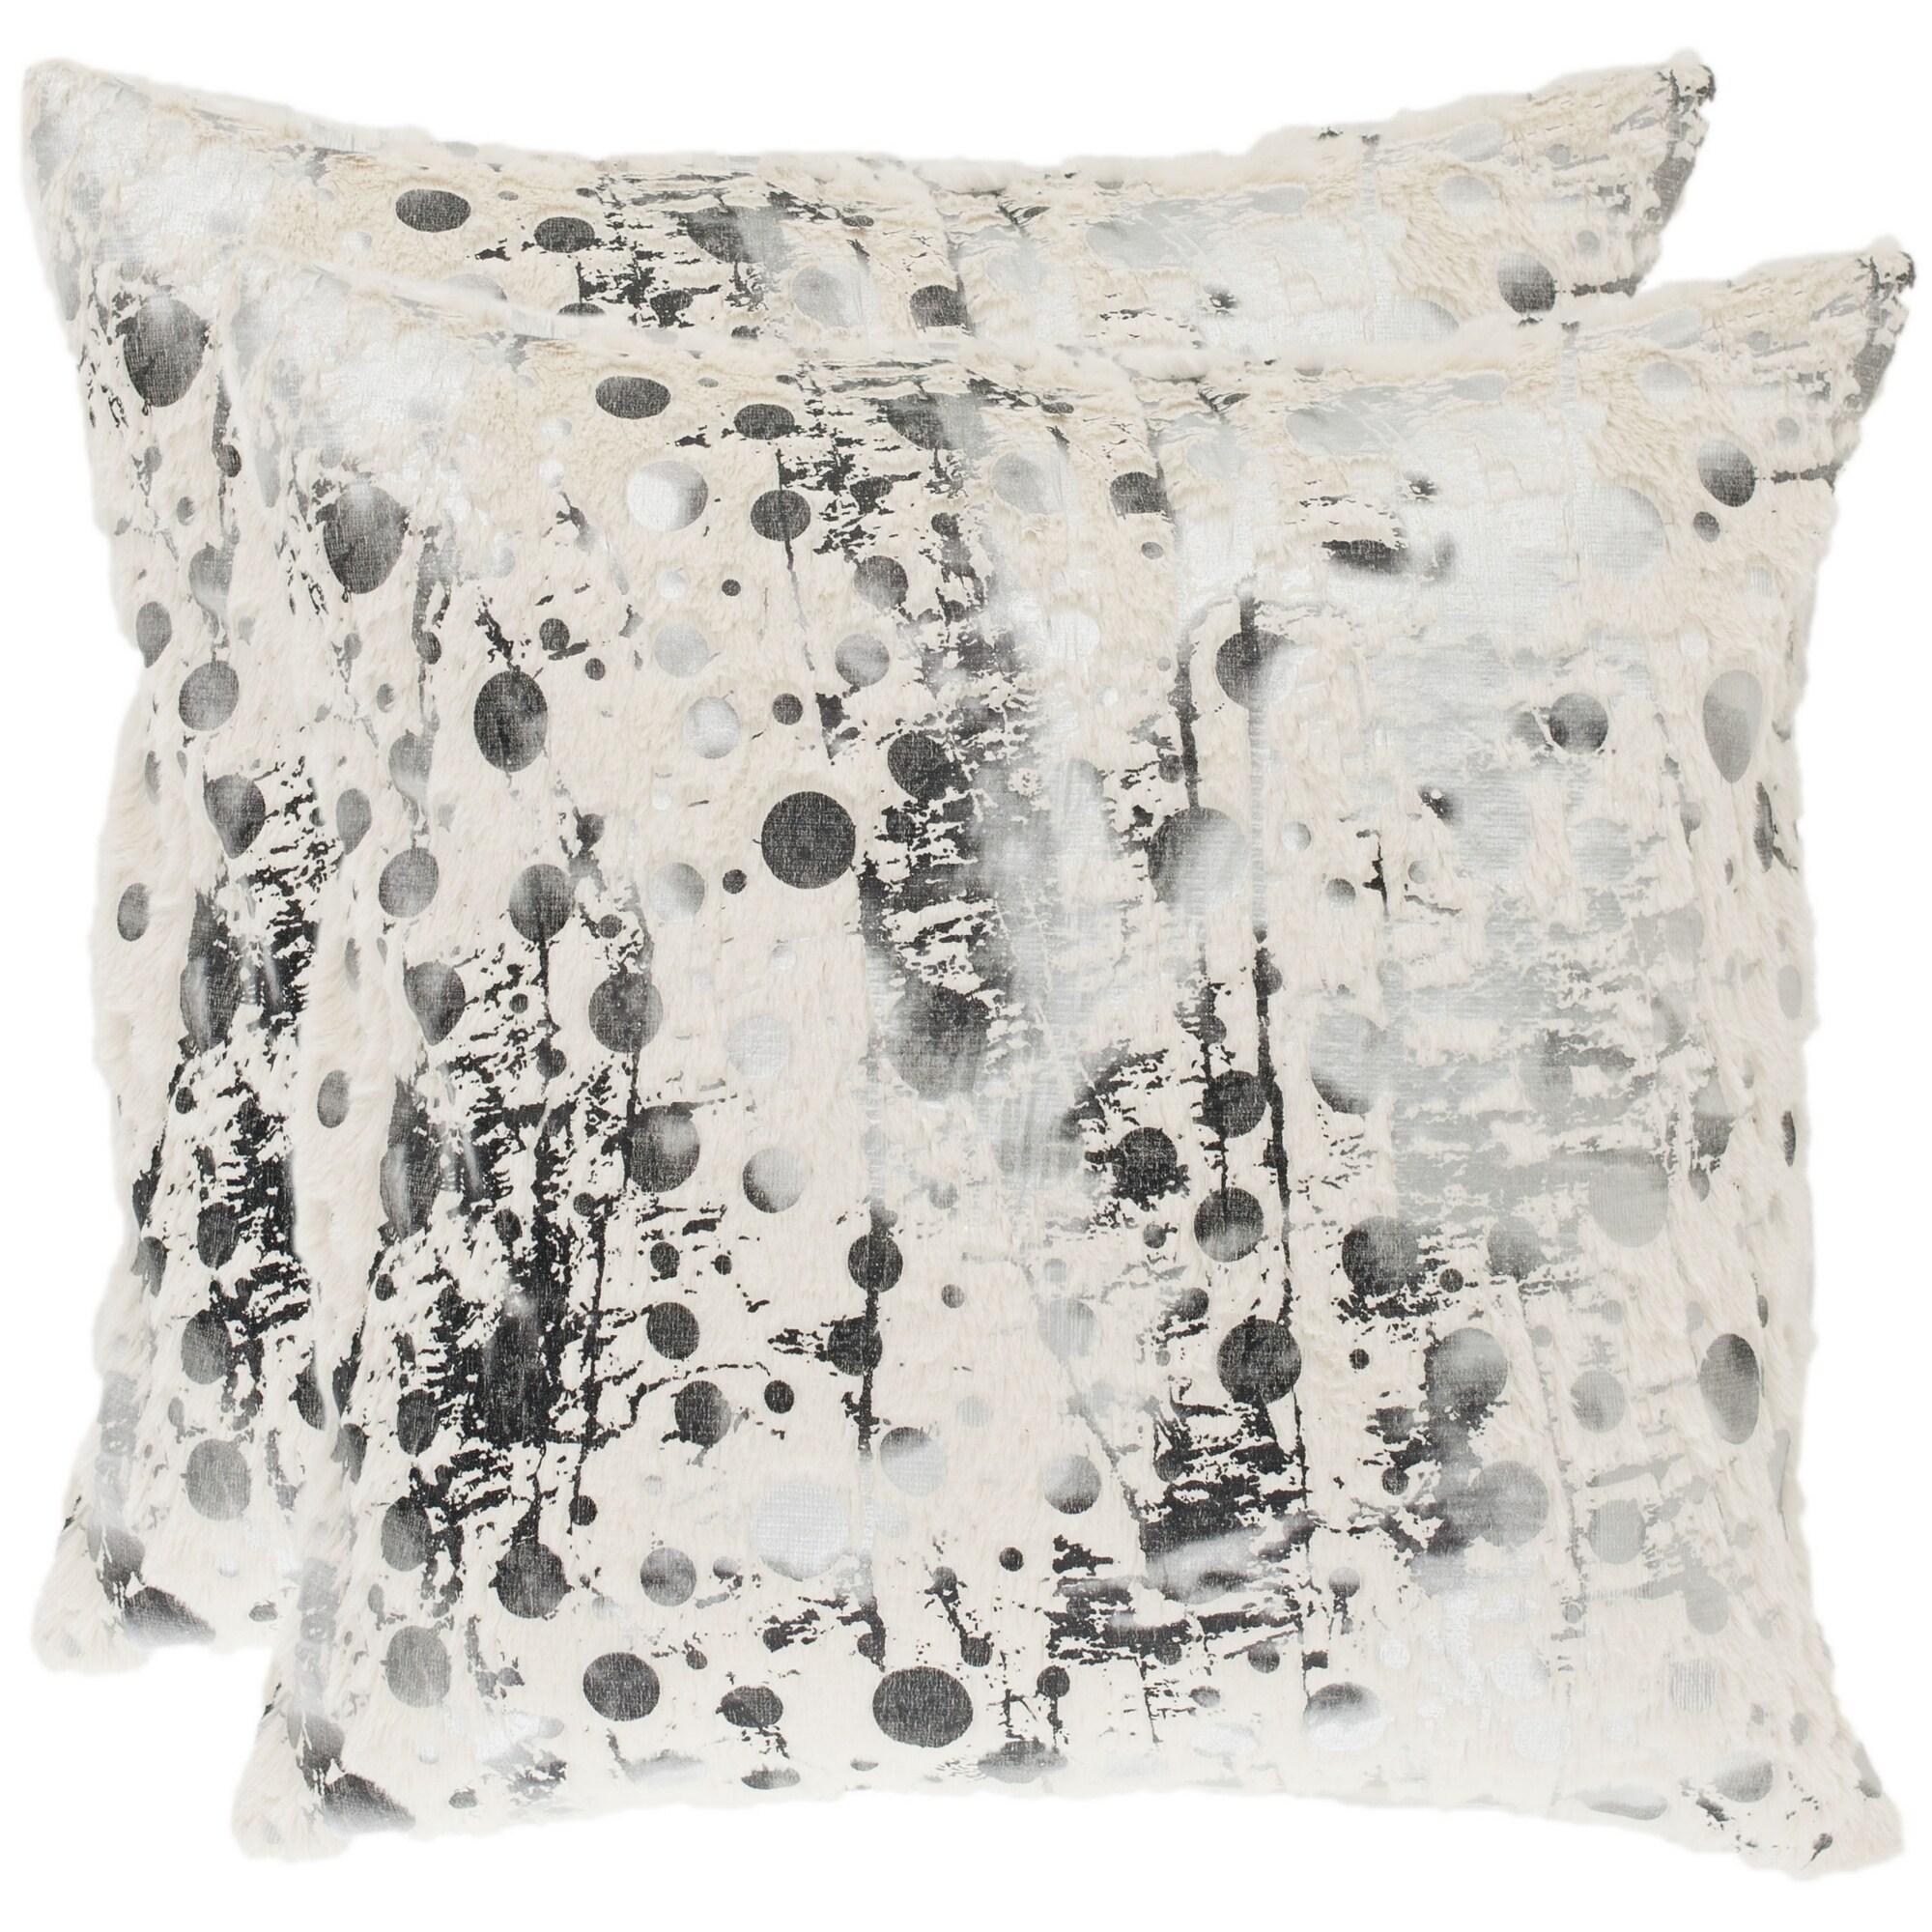 22 Inch White Decorative Pillows